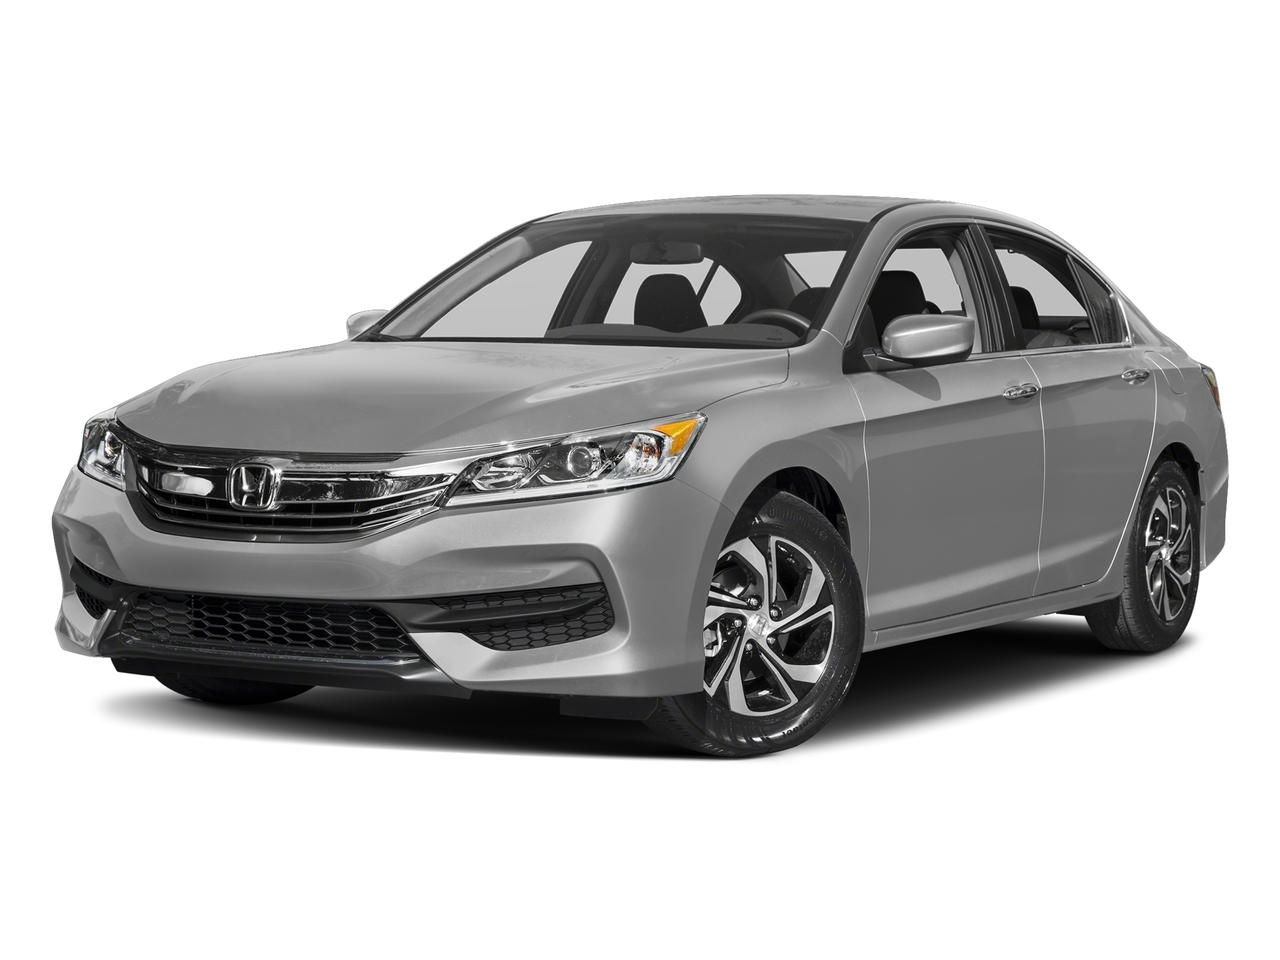 2017 Honda Accord Sedan Vehicle Photo in Owensboro, KY 42303